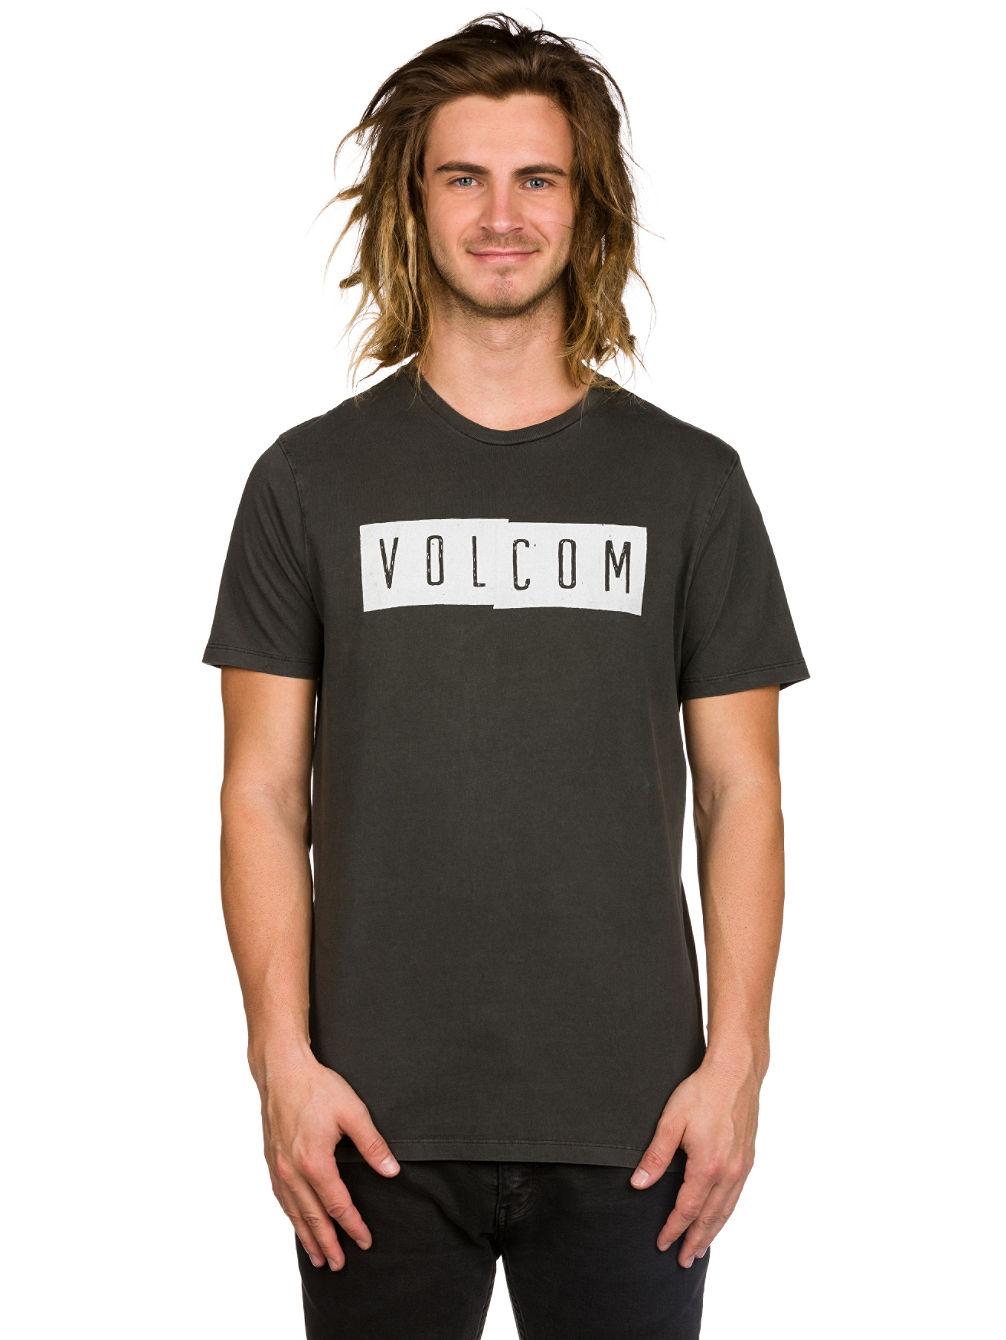 volcom-shifty-t-shirt